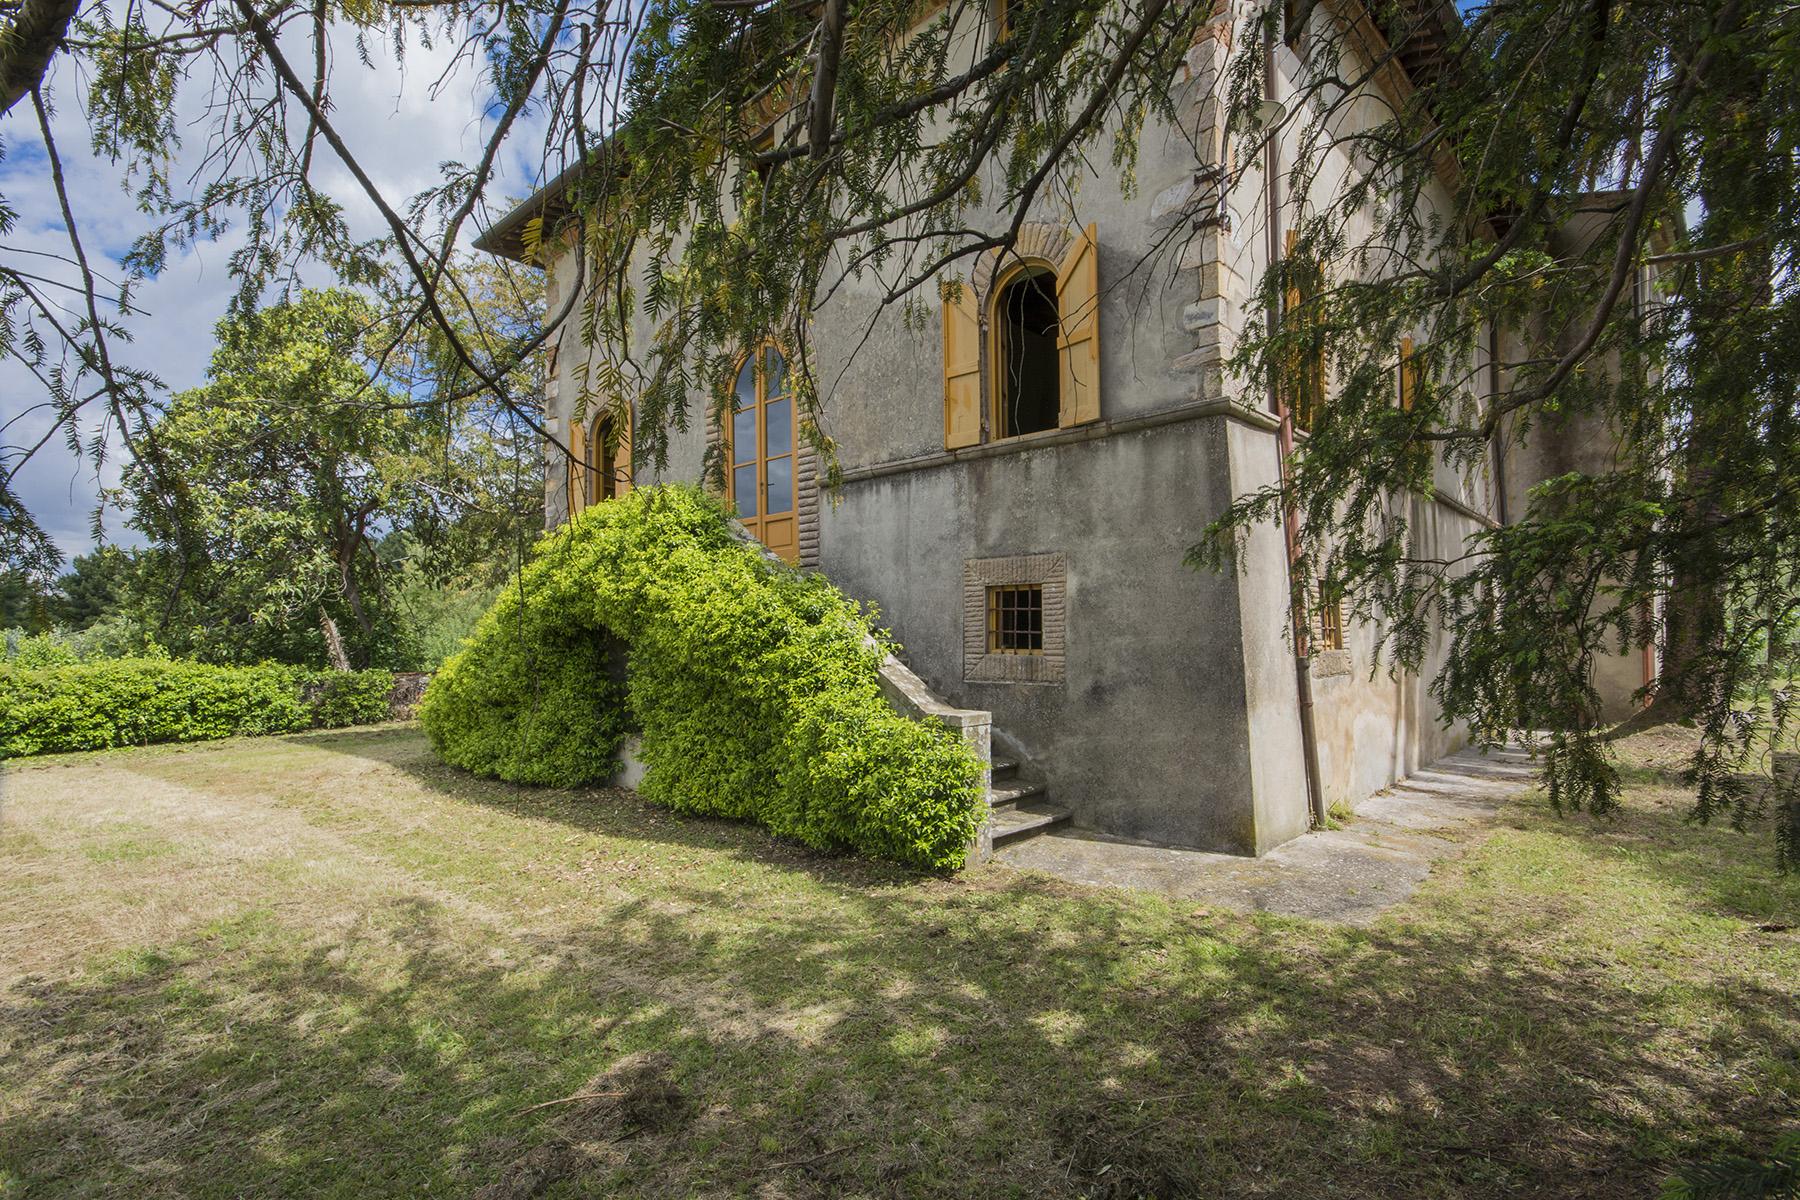 Villa in Vendita a Capannori: 5 locali, 490 mq - Foto 14